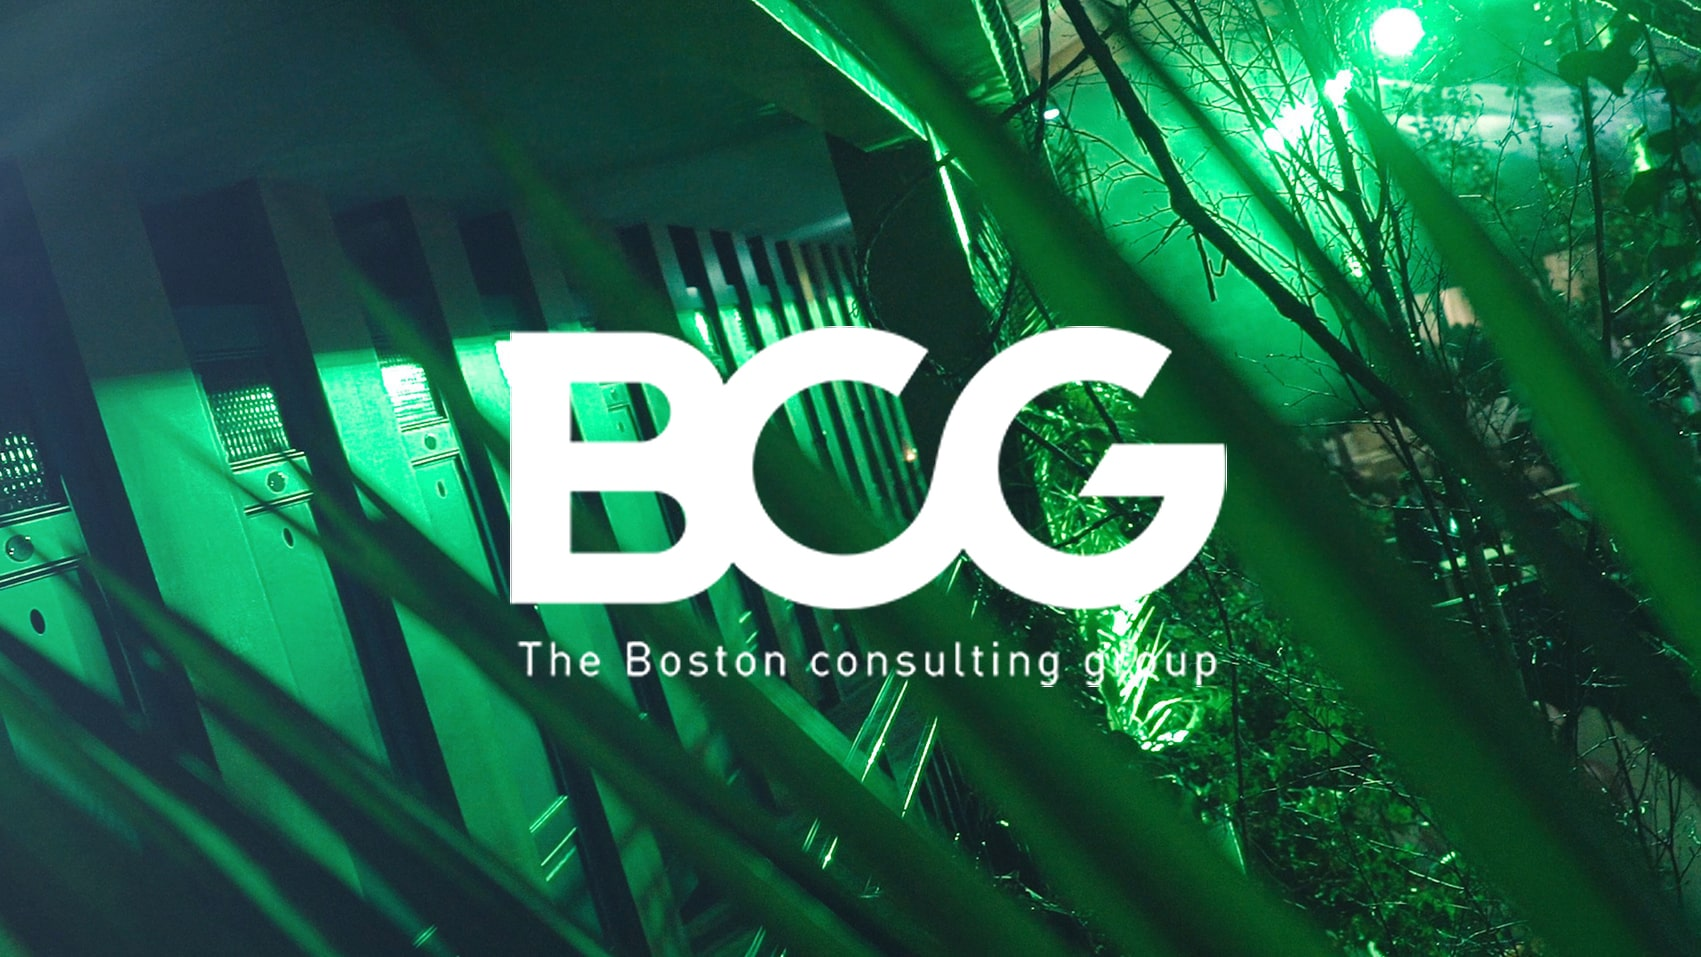 BCG, bostonconsultinggroup, evenemententreprise, soireeentreprise, videosoireeentreprise, videomolitor, videosoireejungle, jungleevenement, BCGevenementvideo, bostonconsultinggroupevideo, parisevenementvideo, cubriks, theodeffaux,